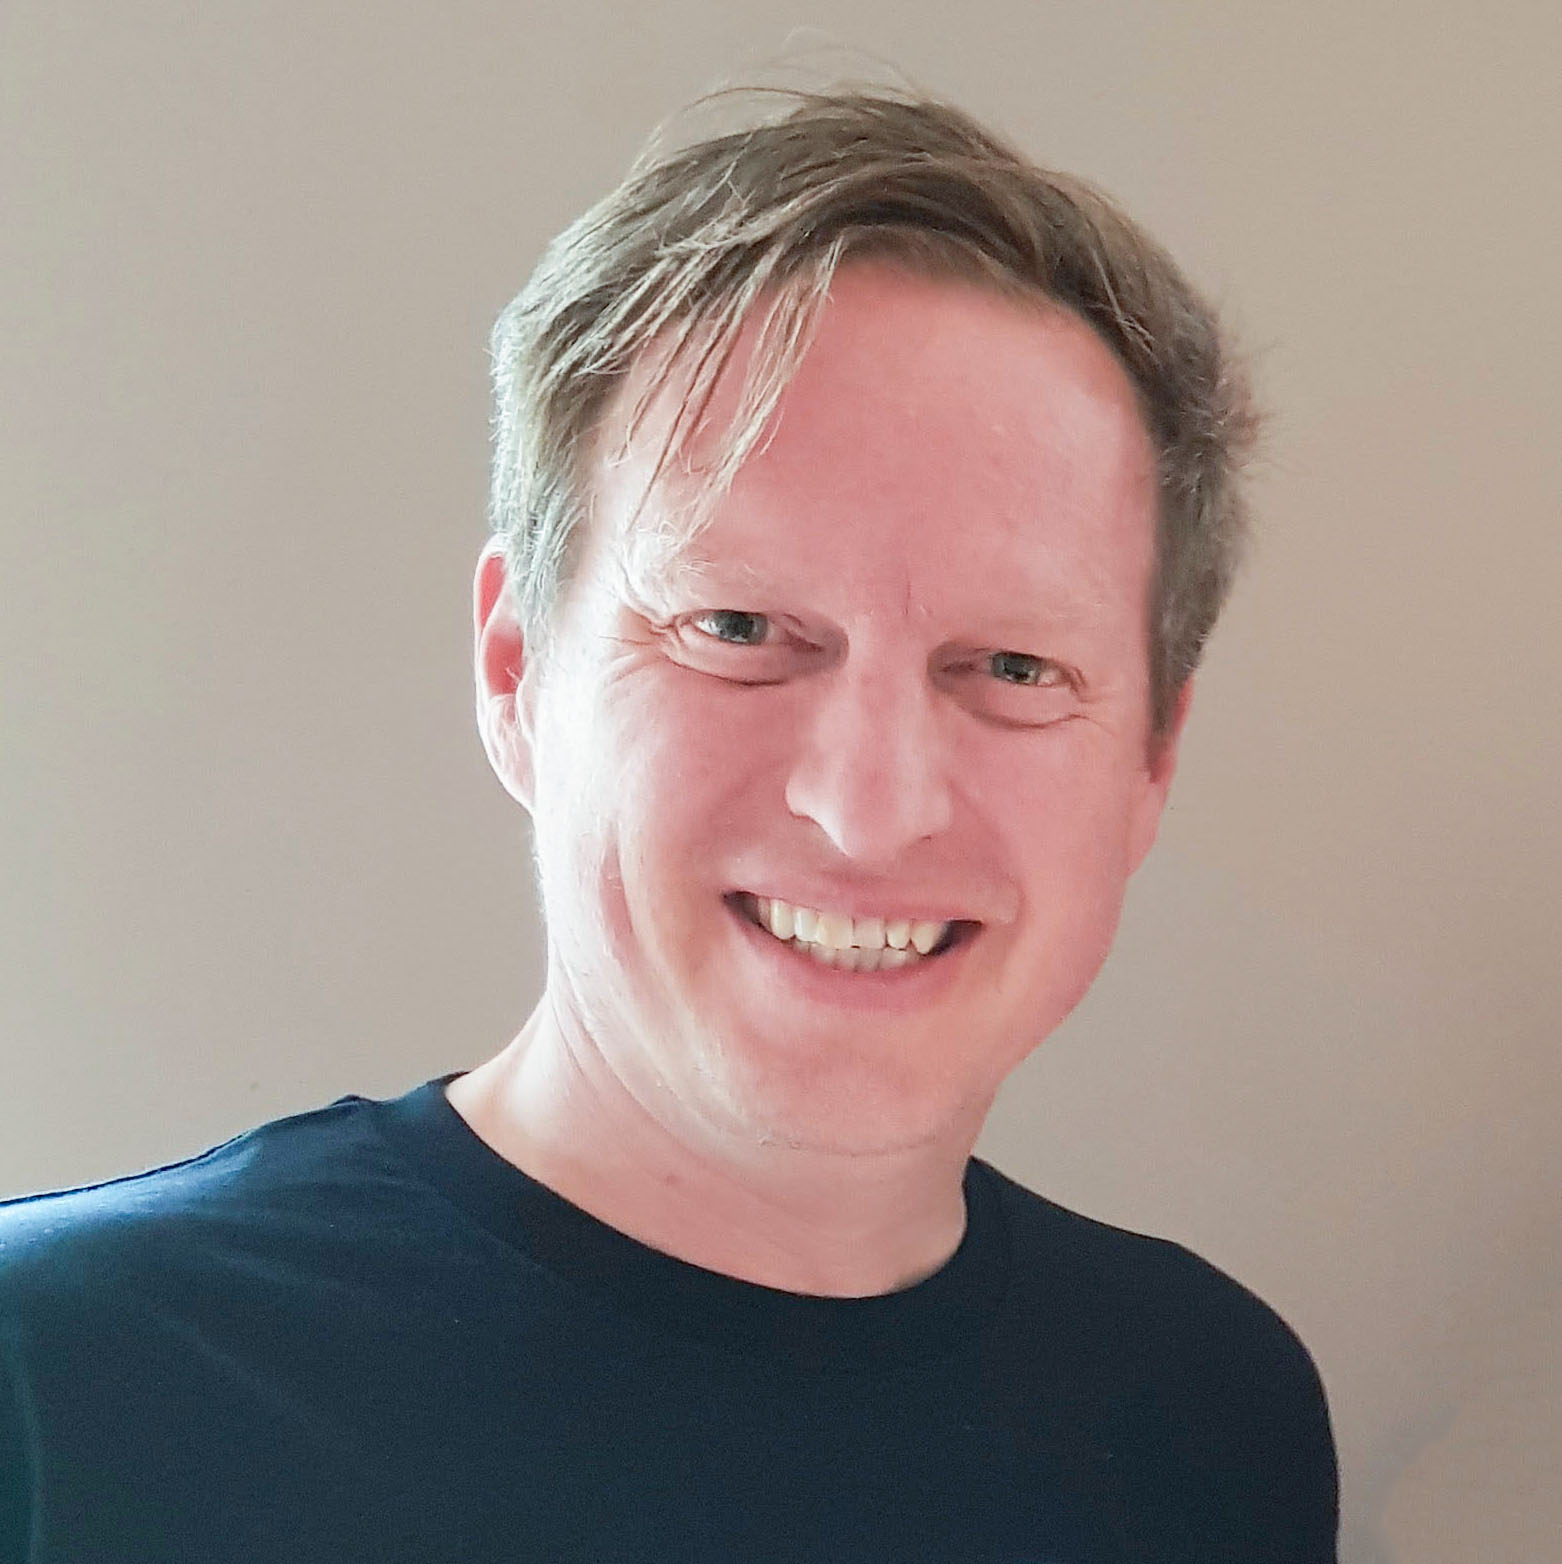 Michael Carden : Joyous